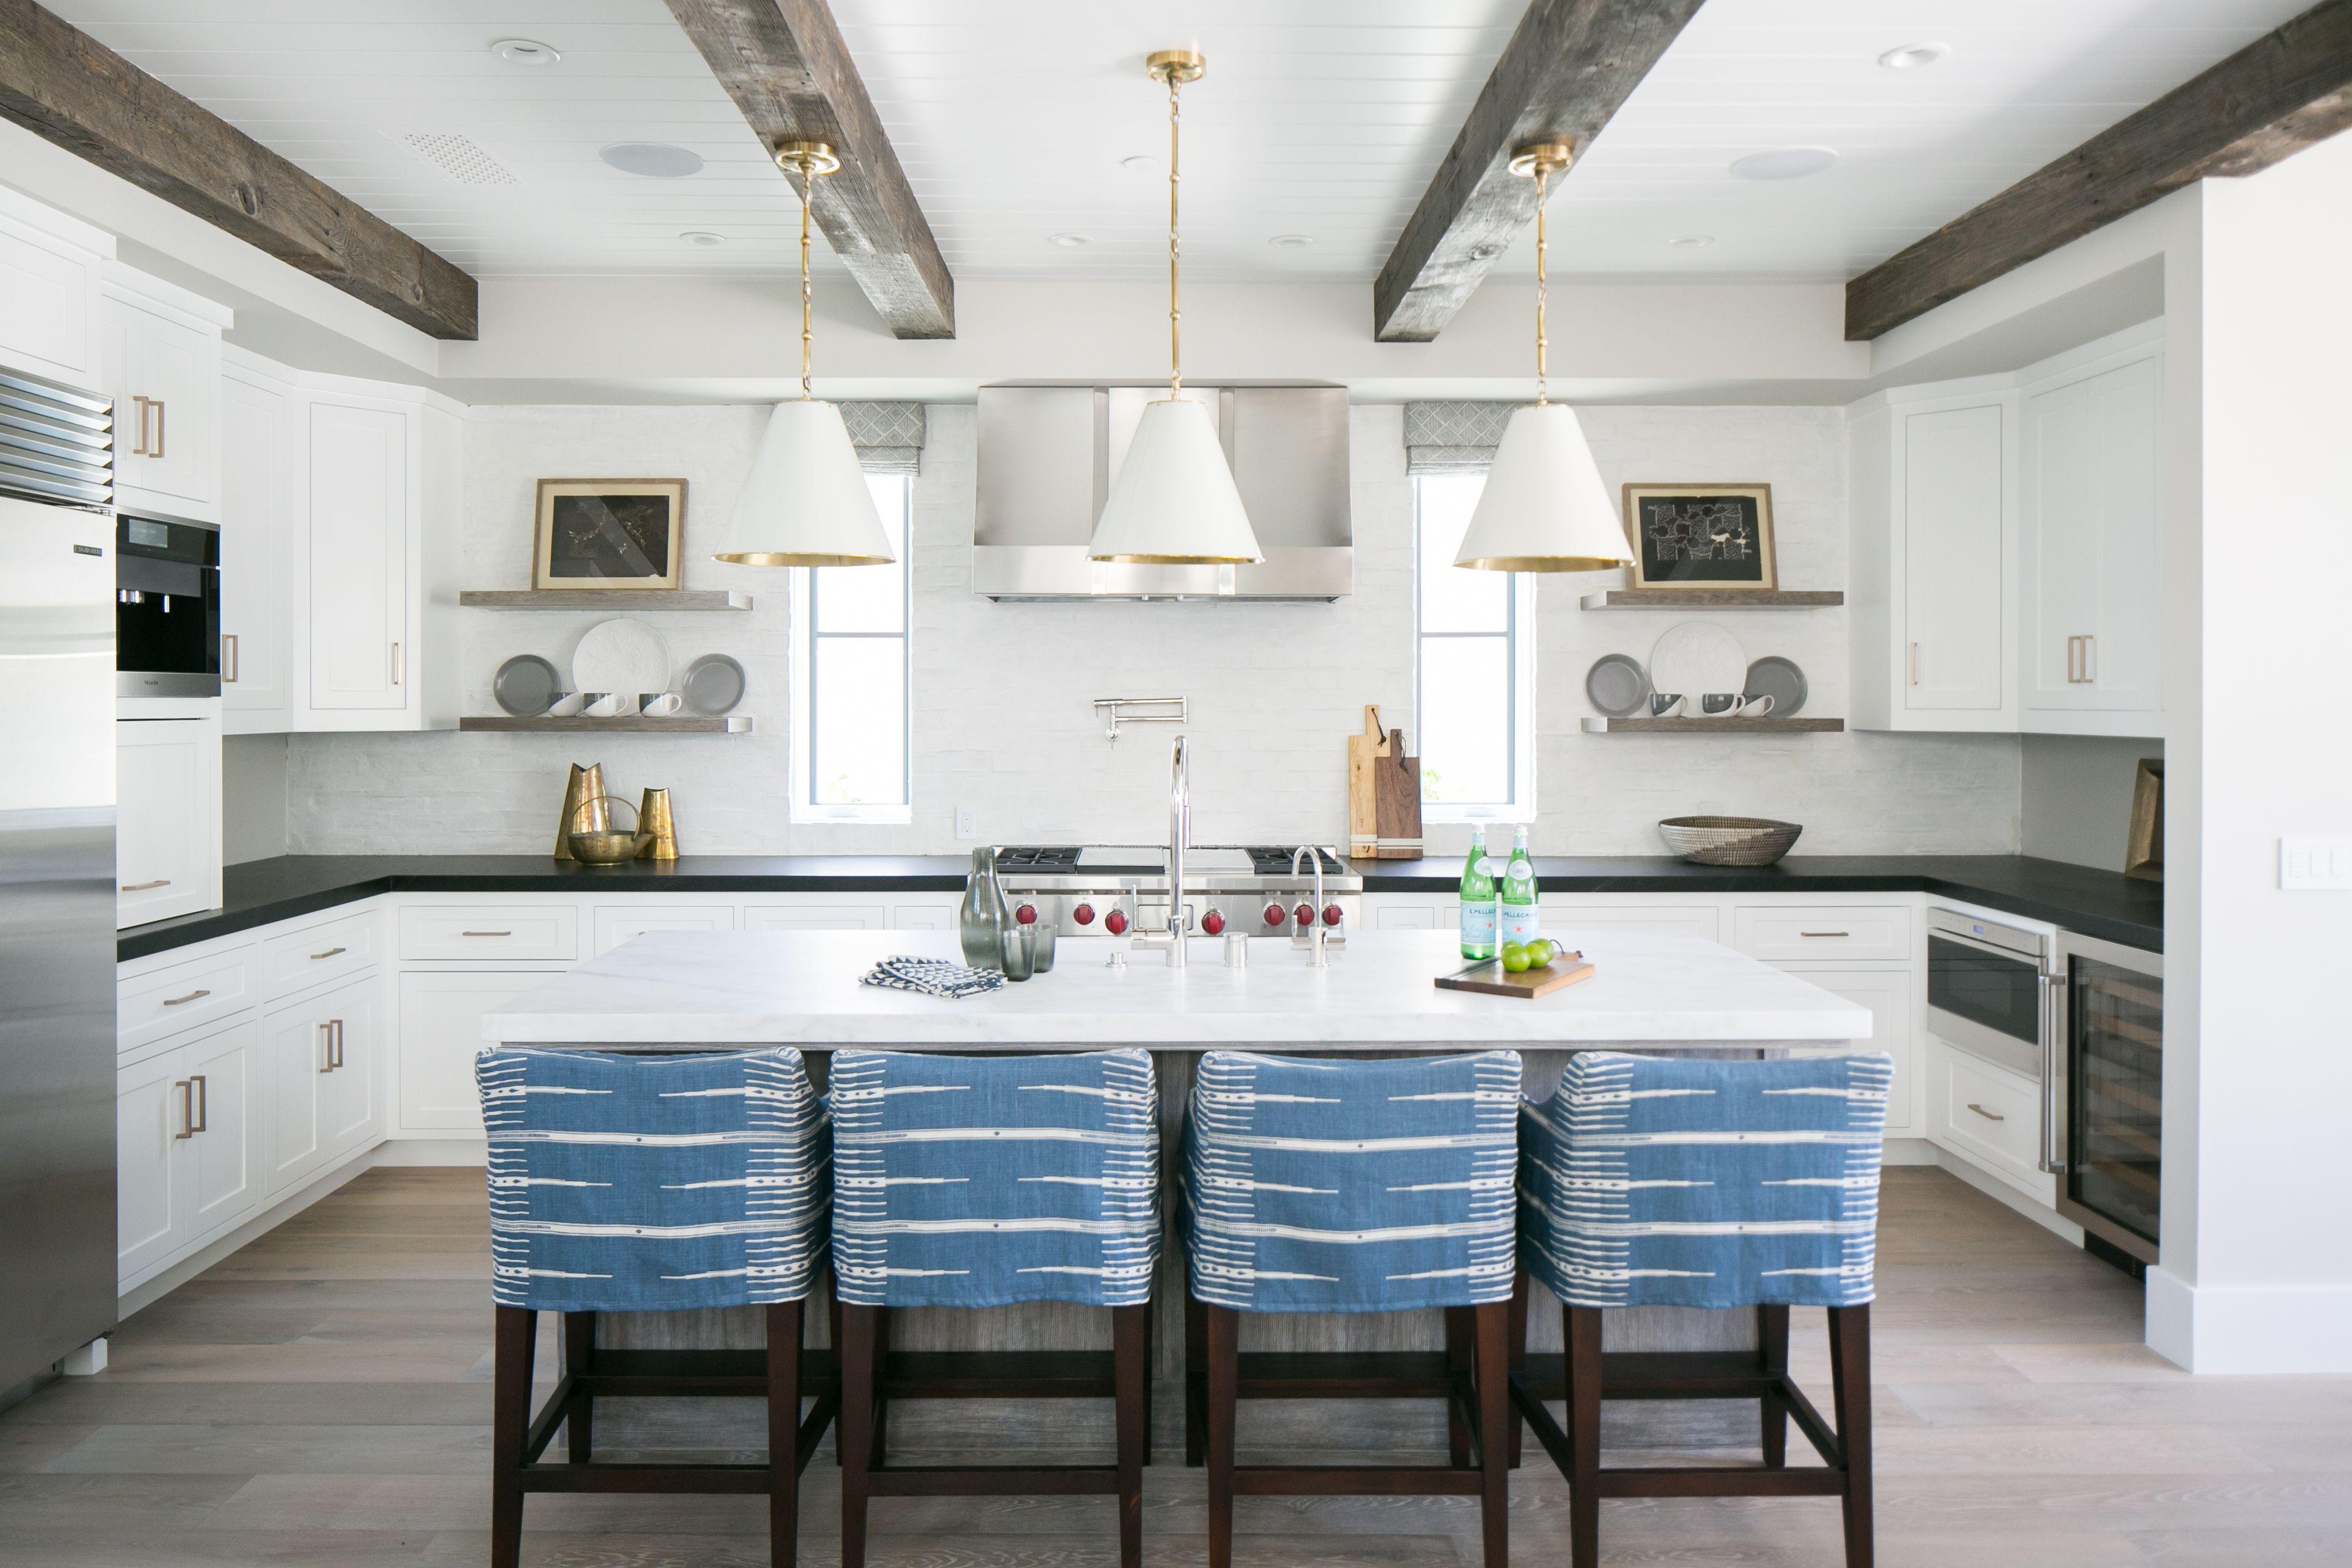 Kitchen White Kitchen Reclaimed Wood Beams Home Kitchens Home Kitchen Design